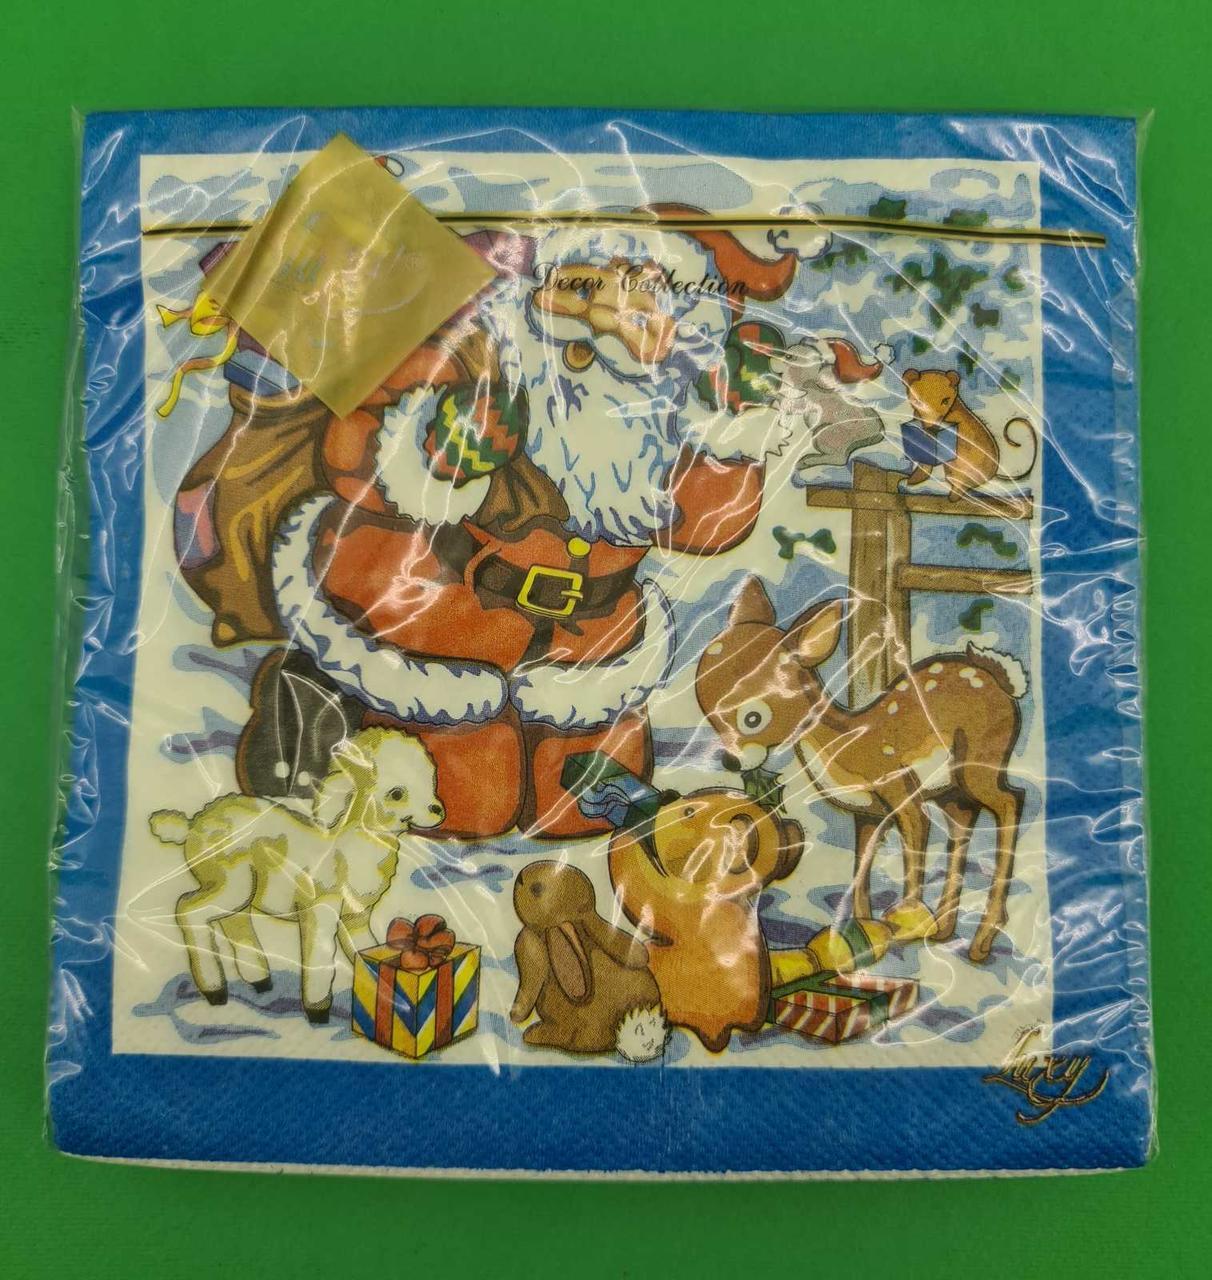 Салфетки бумажные ЗЗхЗЗ 20шт  Дед мороз и Звери (1 пач)